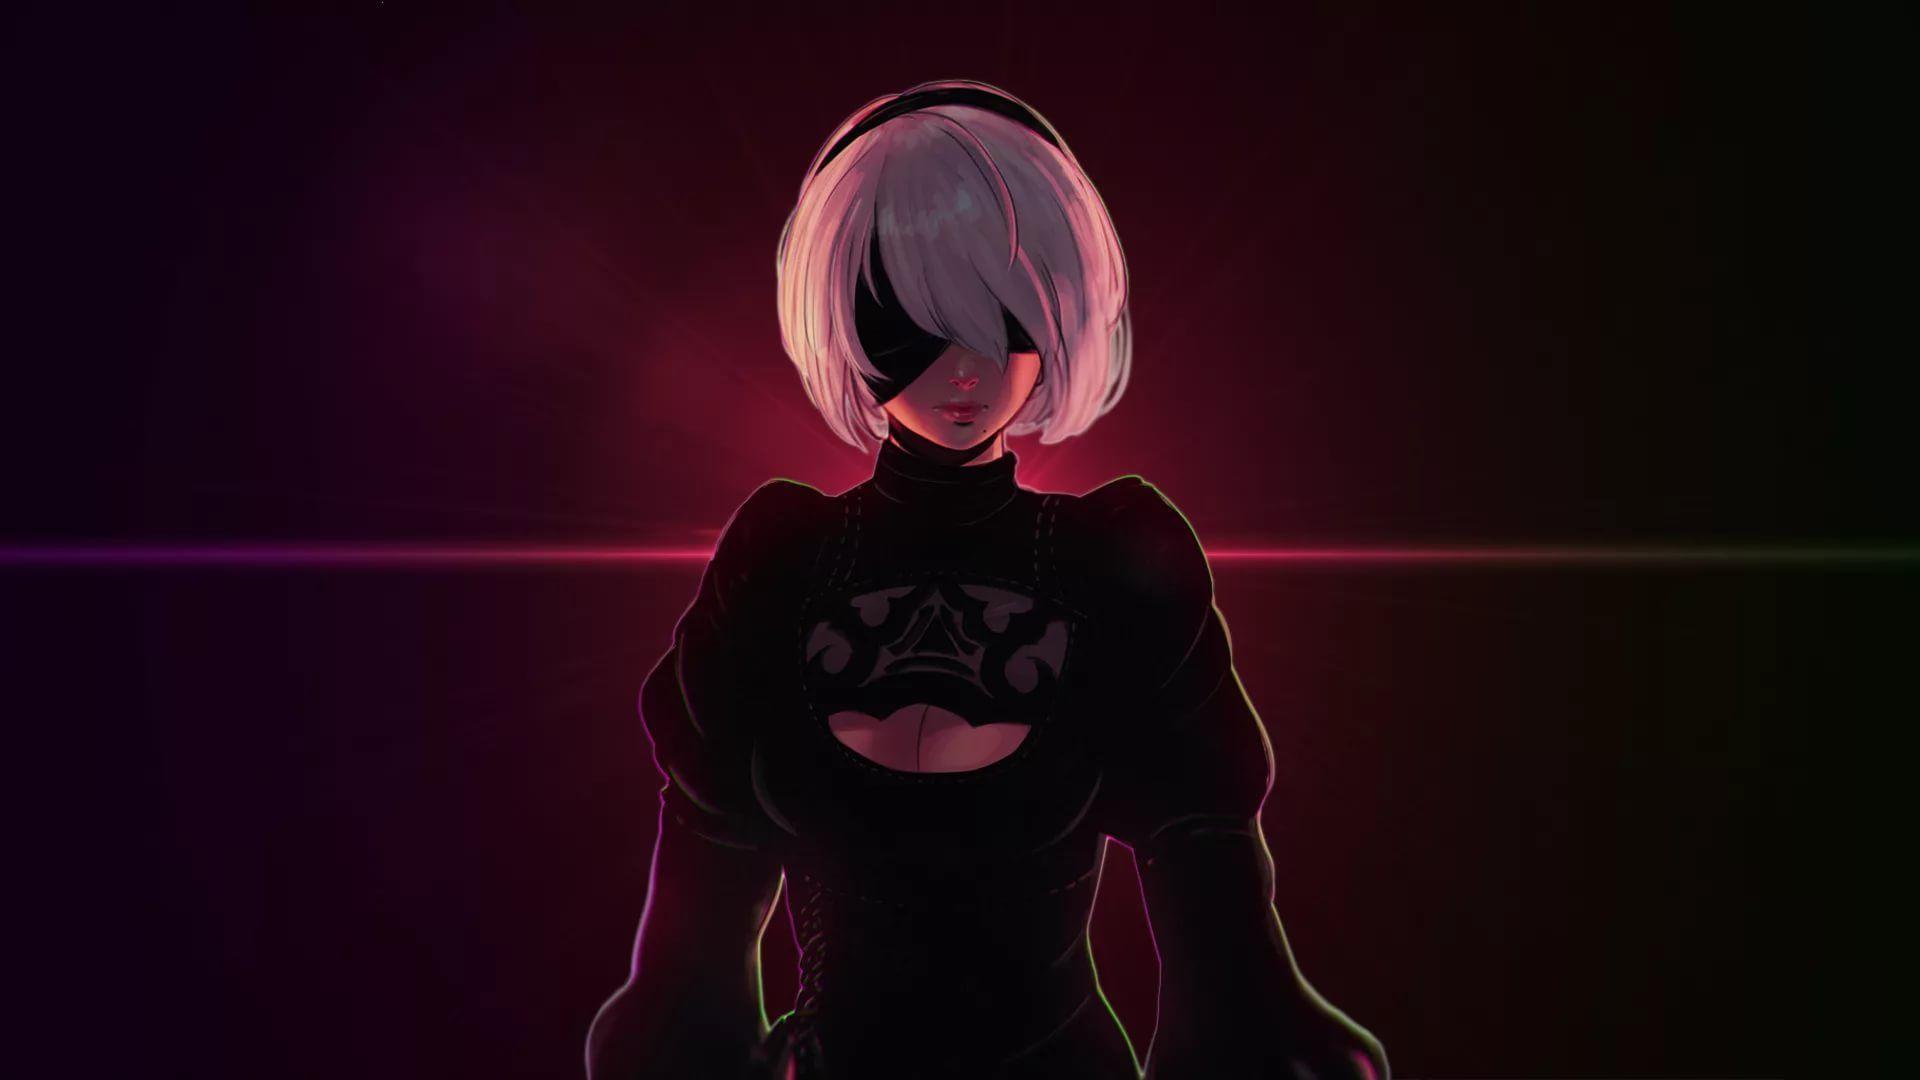 Dark Anime High Quality